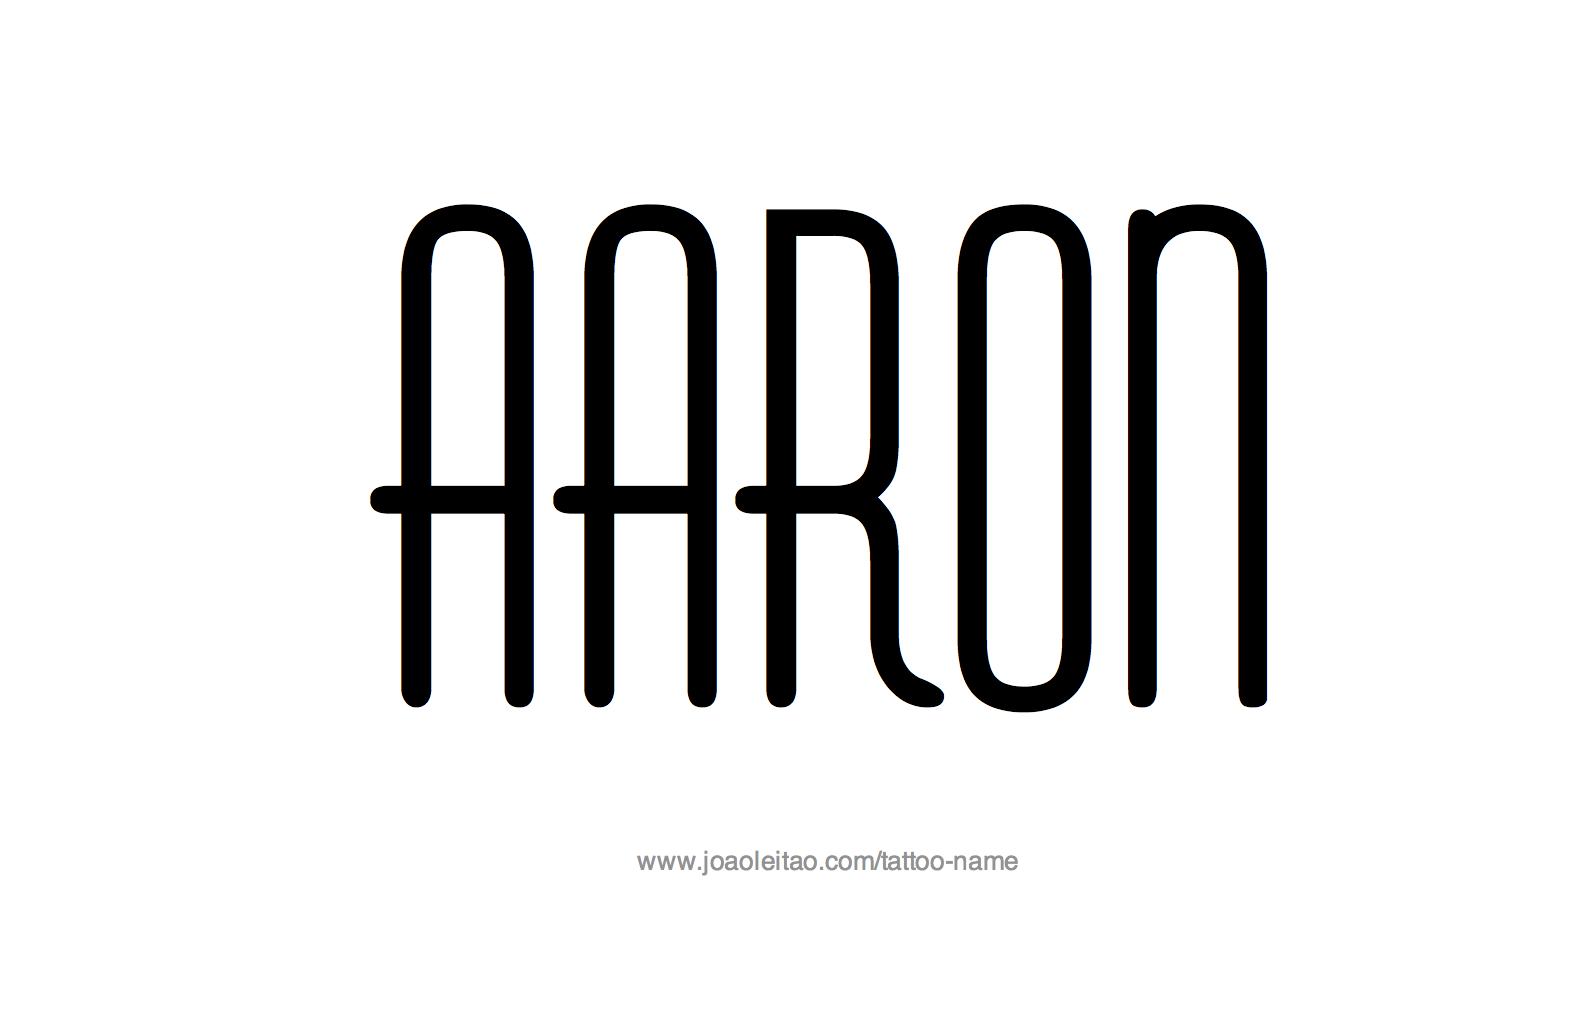 Aaron Name Tattoo Designs